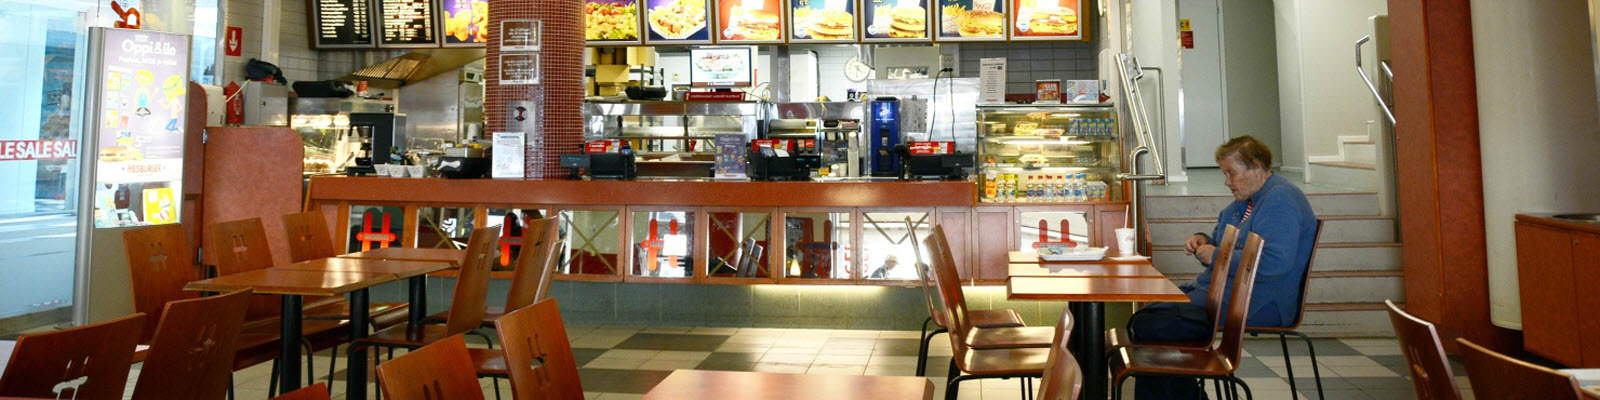 modern fast-food restaurant